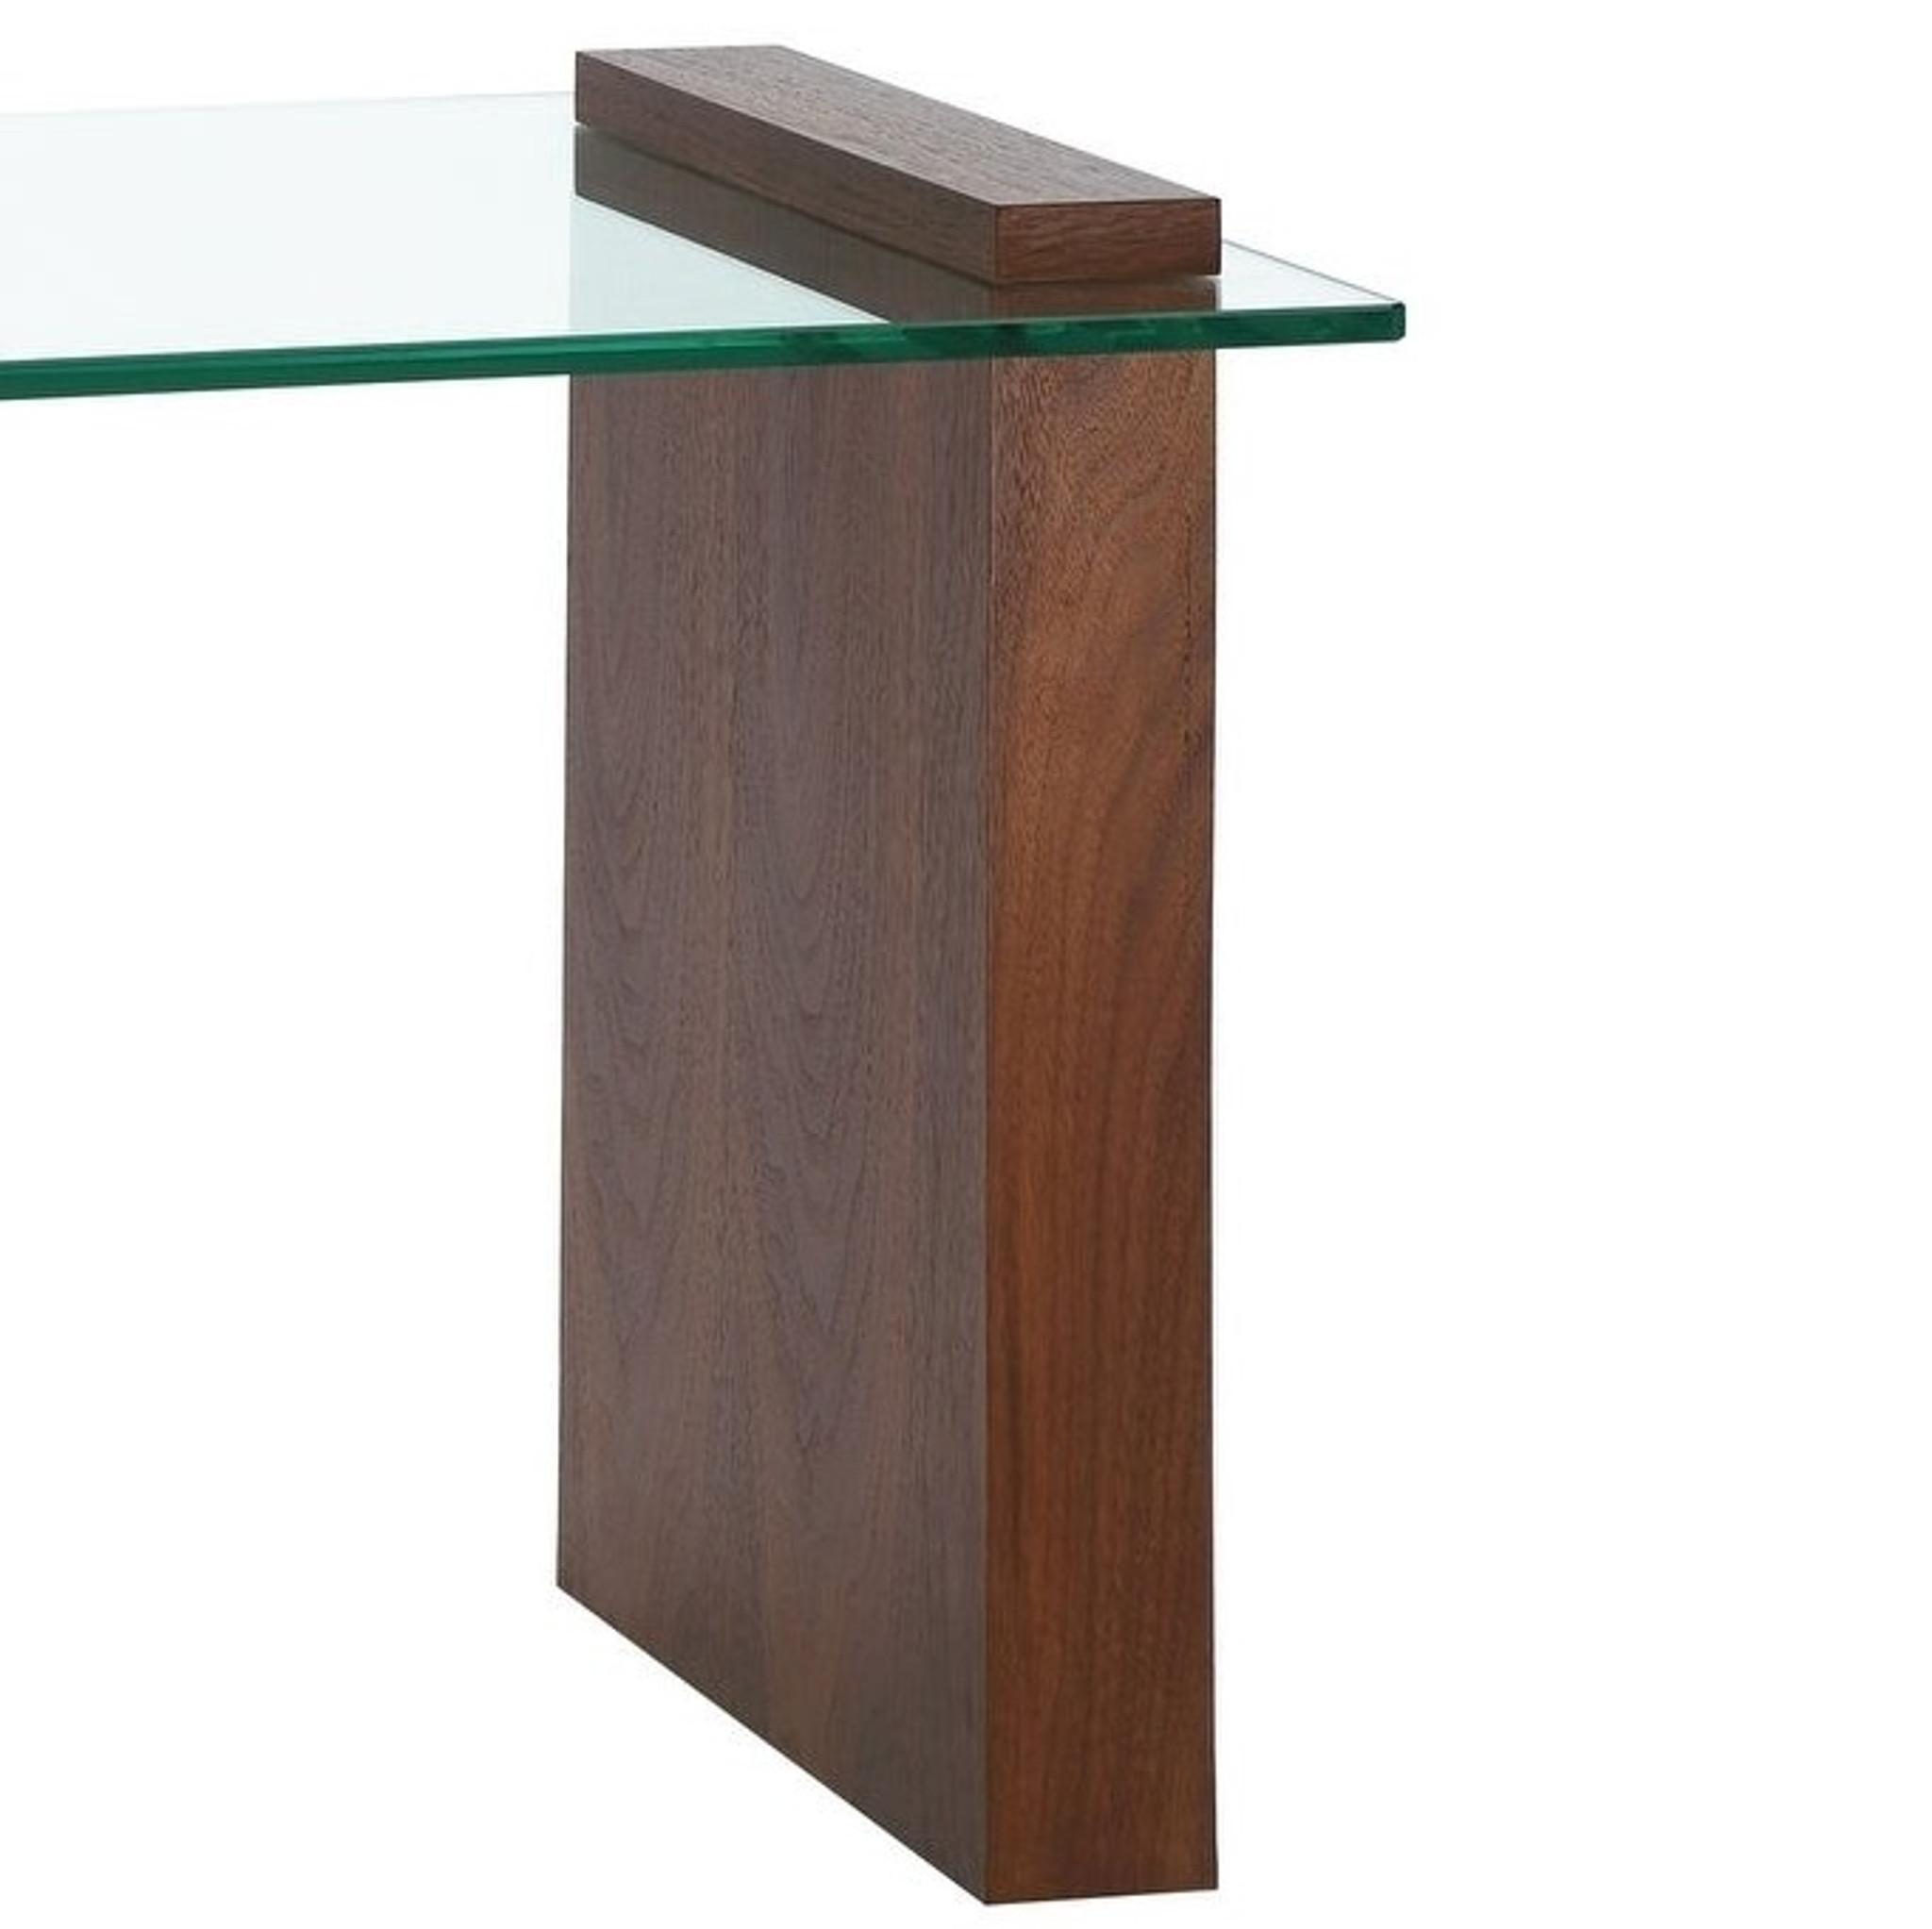 Buono Walnut Veneer W 1/2 Clear Glass console Table Casabianca Home CB-1154-END-WAL contemporary